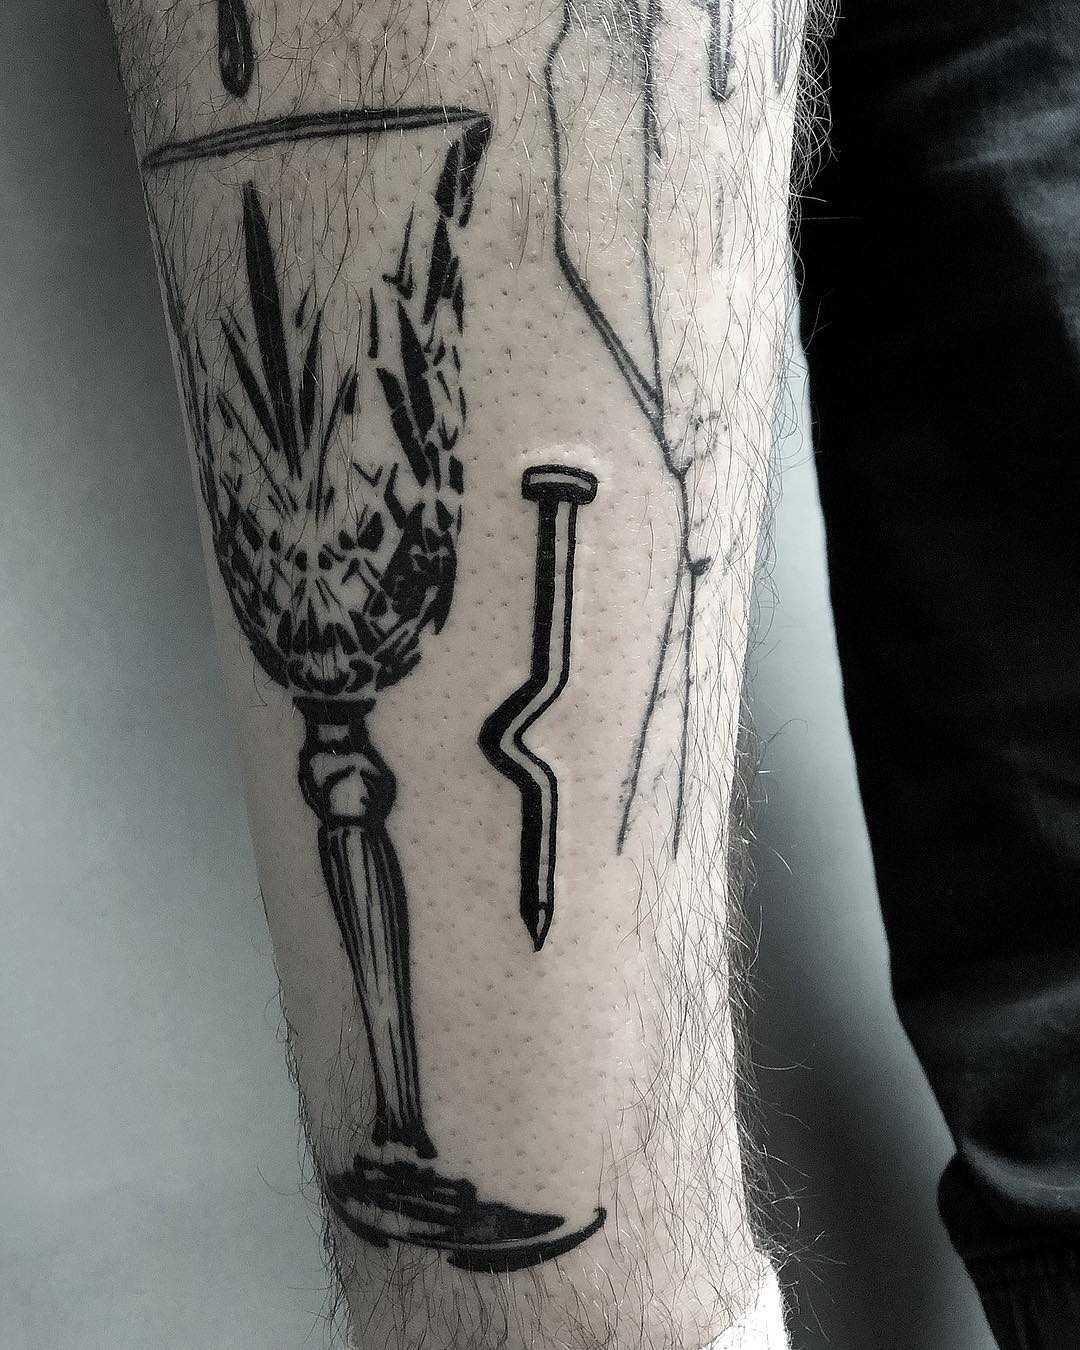 Bent nail tattoo by Loz McLean